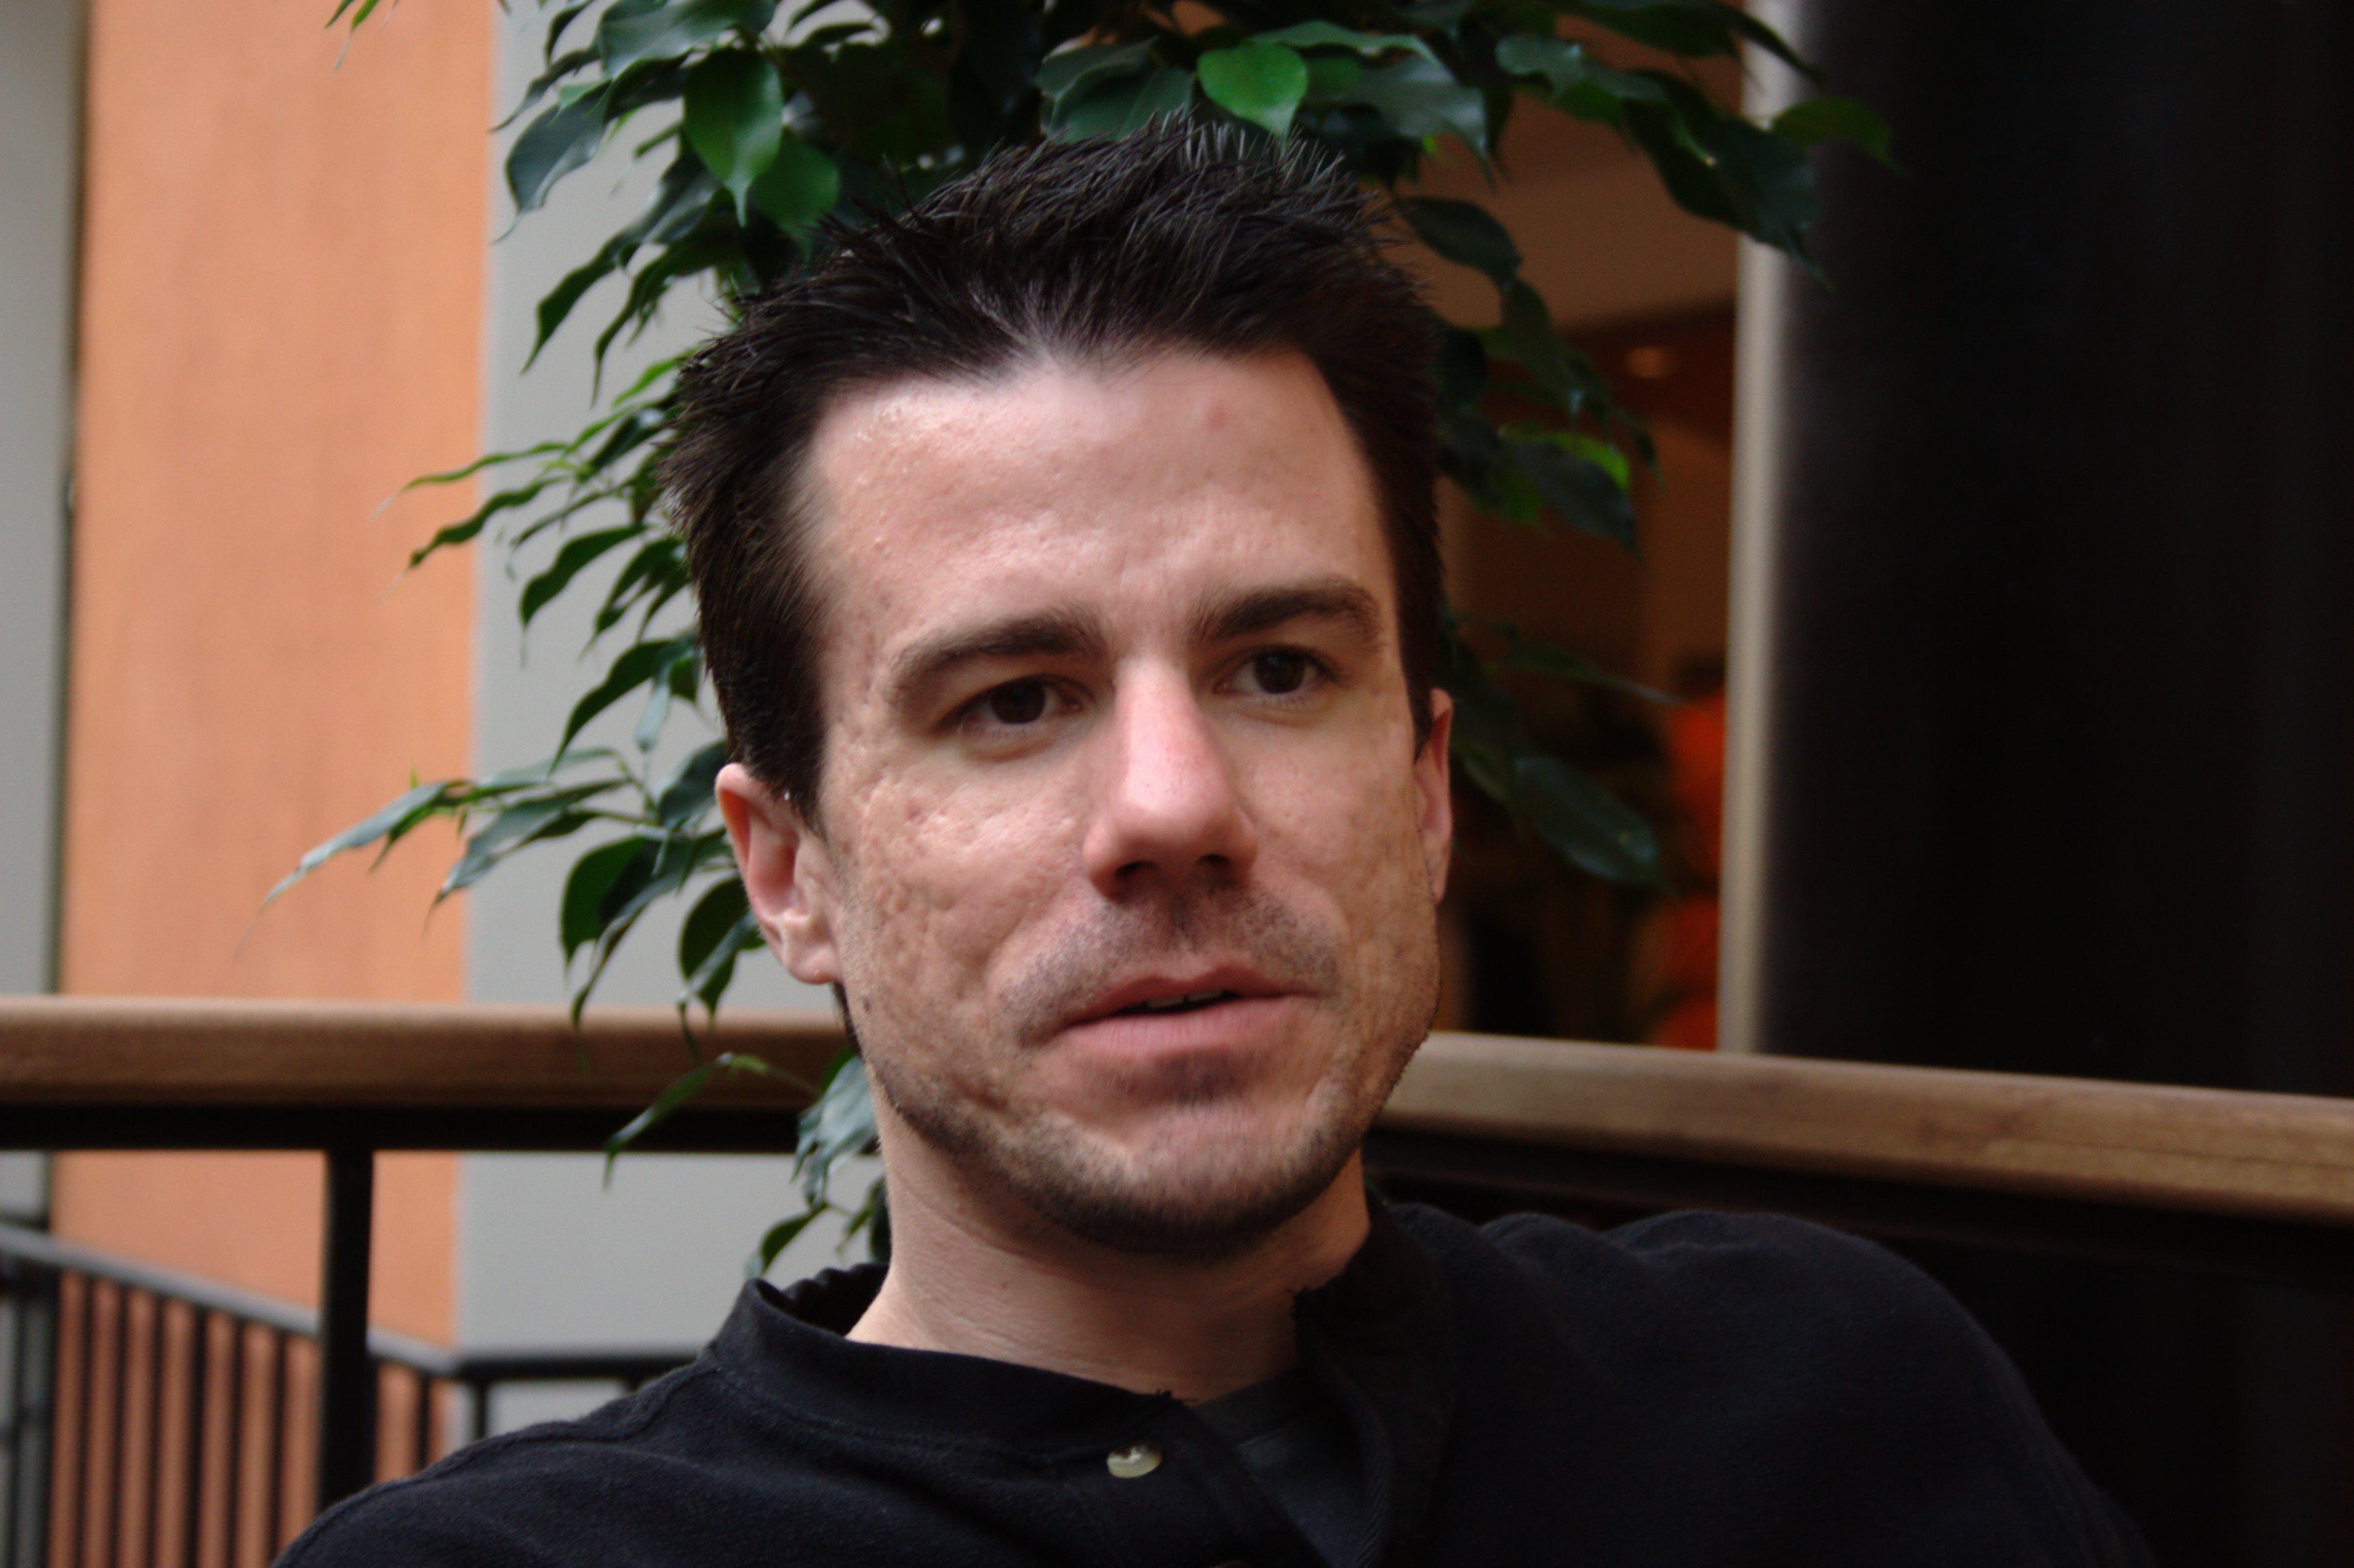 La tragique disparition de Ian Murdock, fondateur de Debian